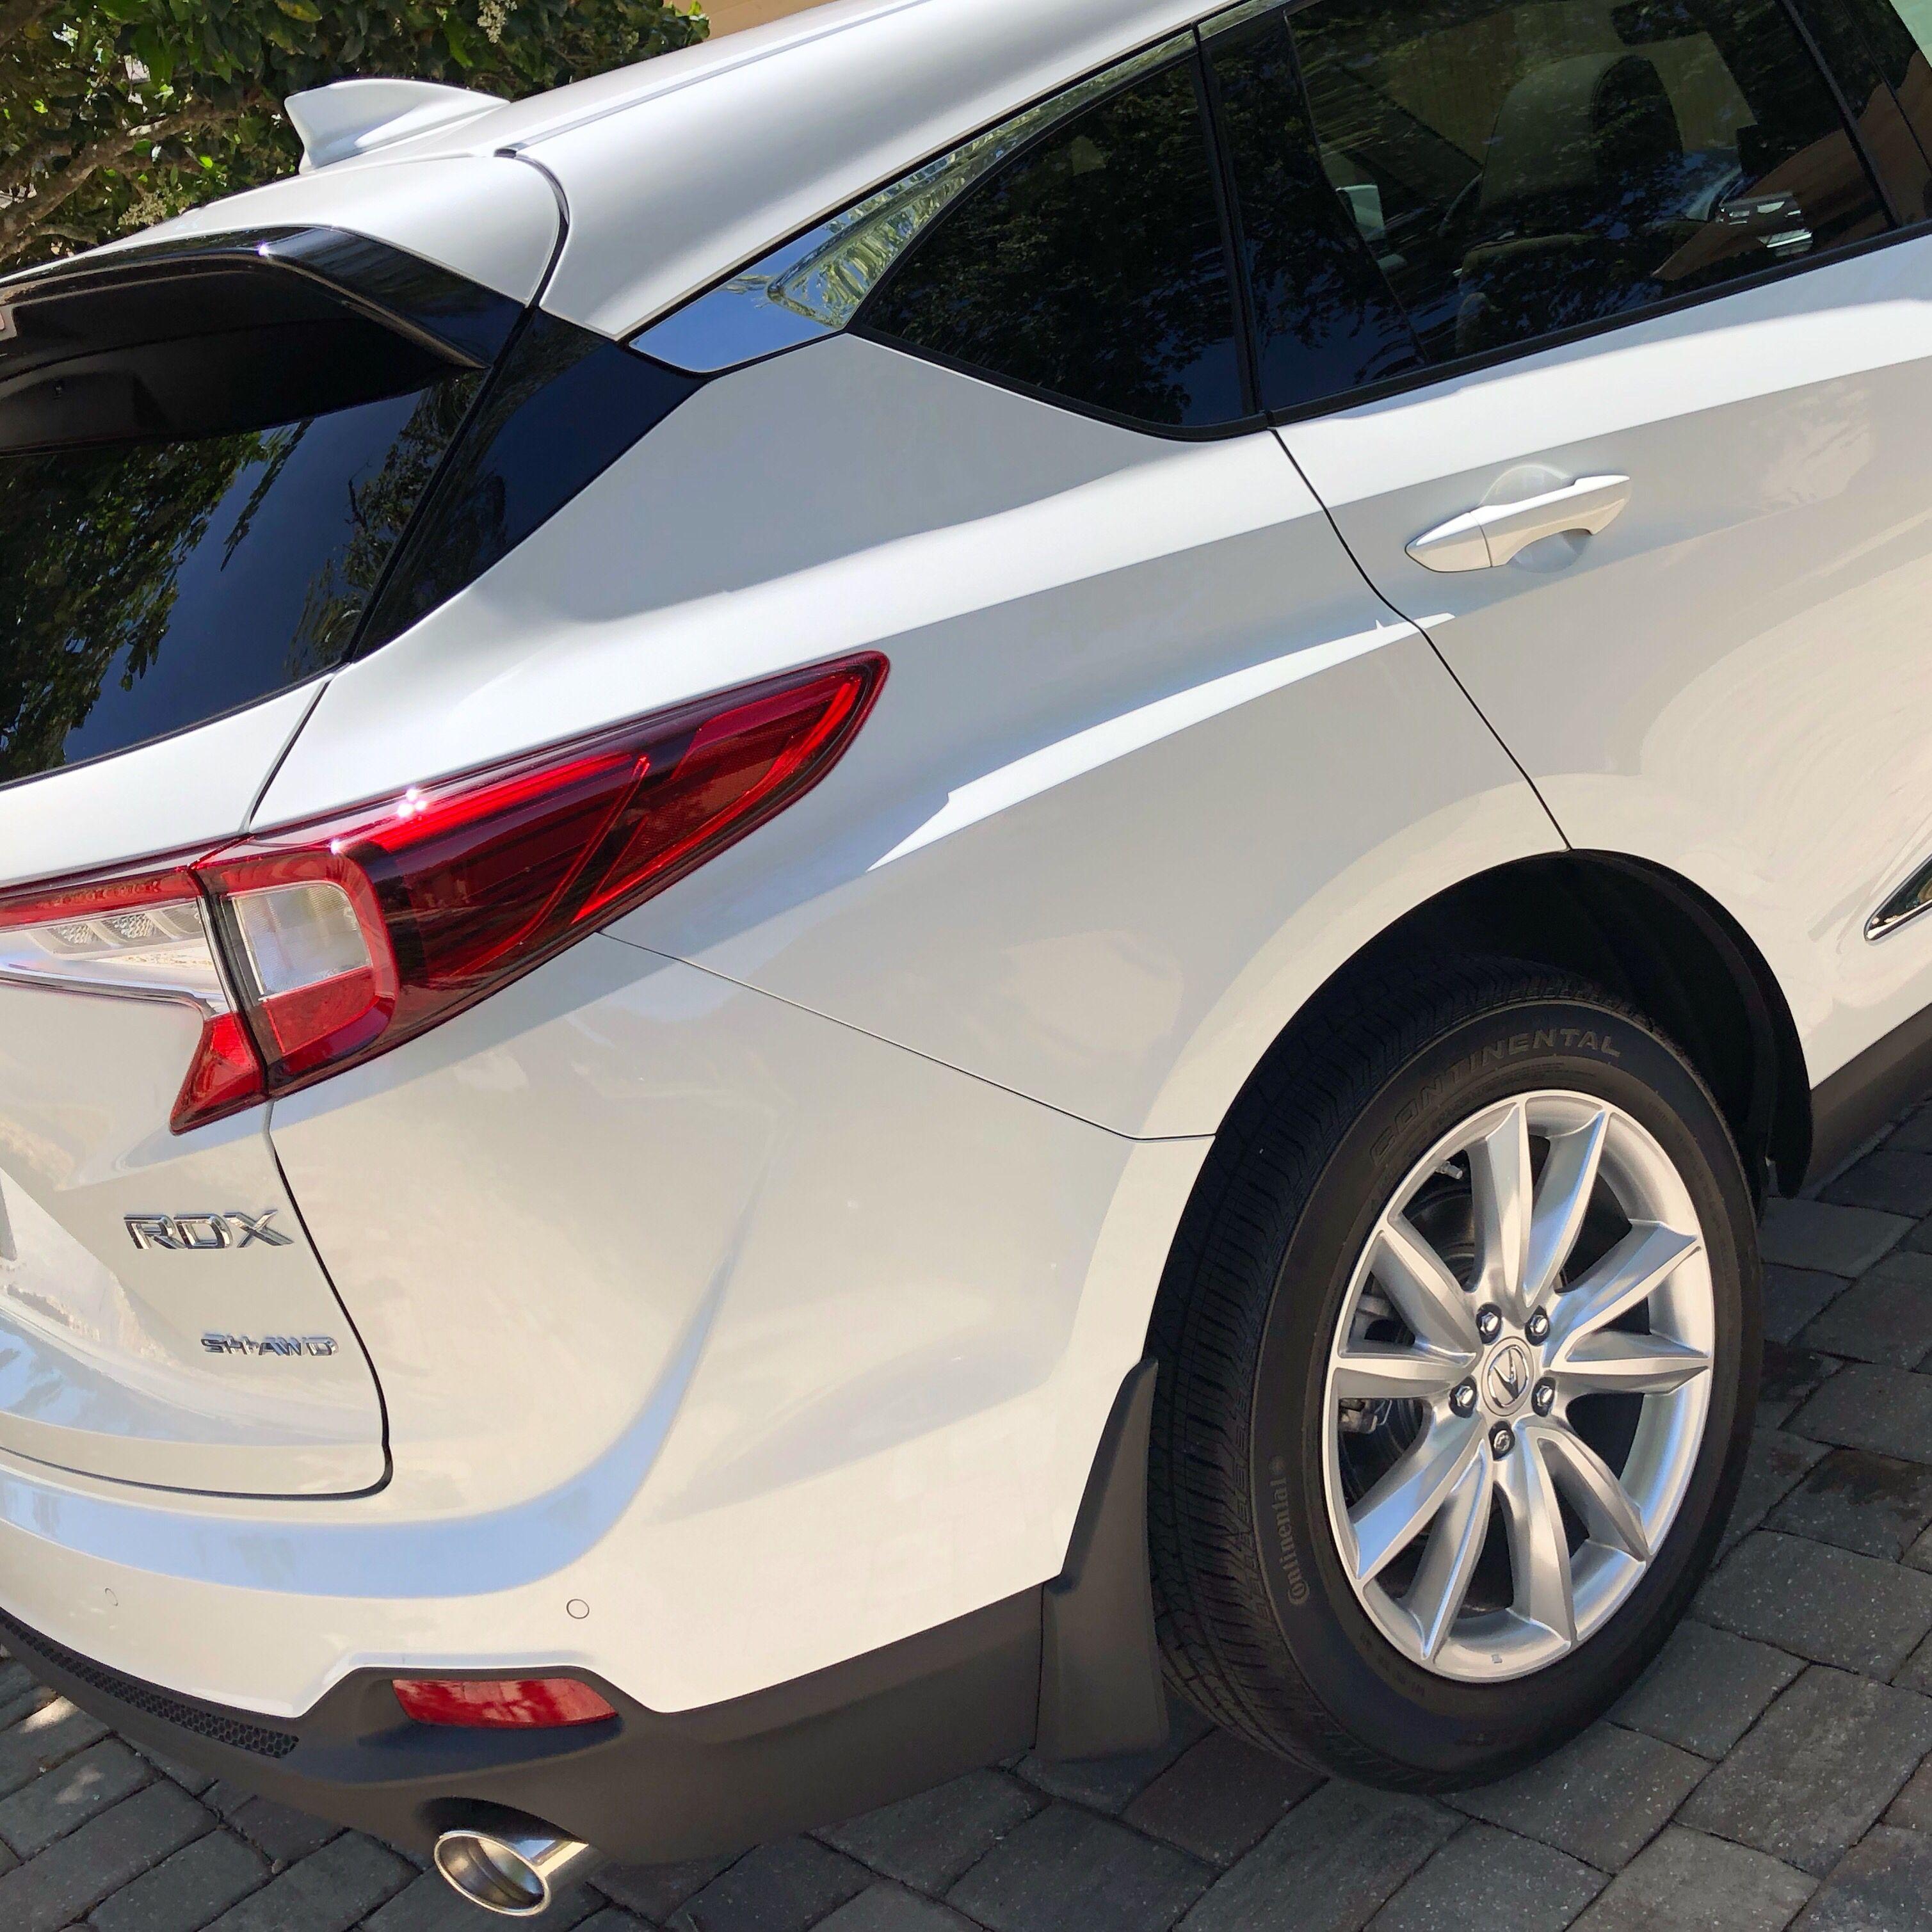 #Acura #RDX @WashNinja Premium #GreenFriendly Luxury